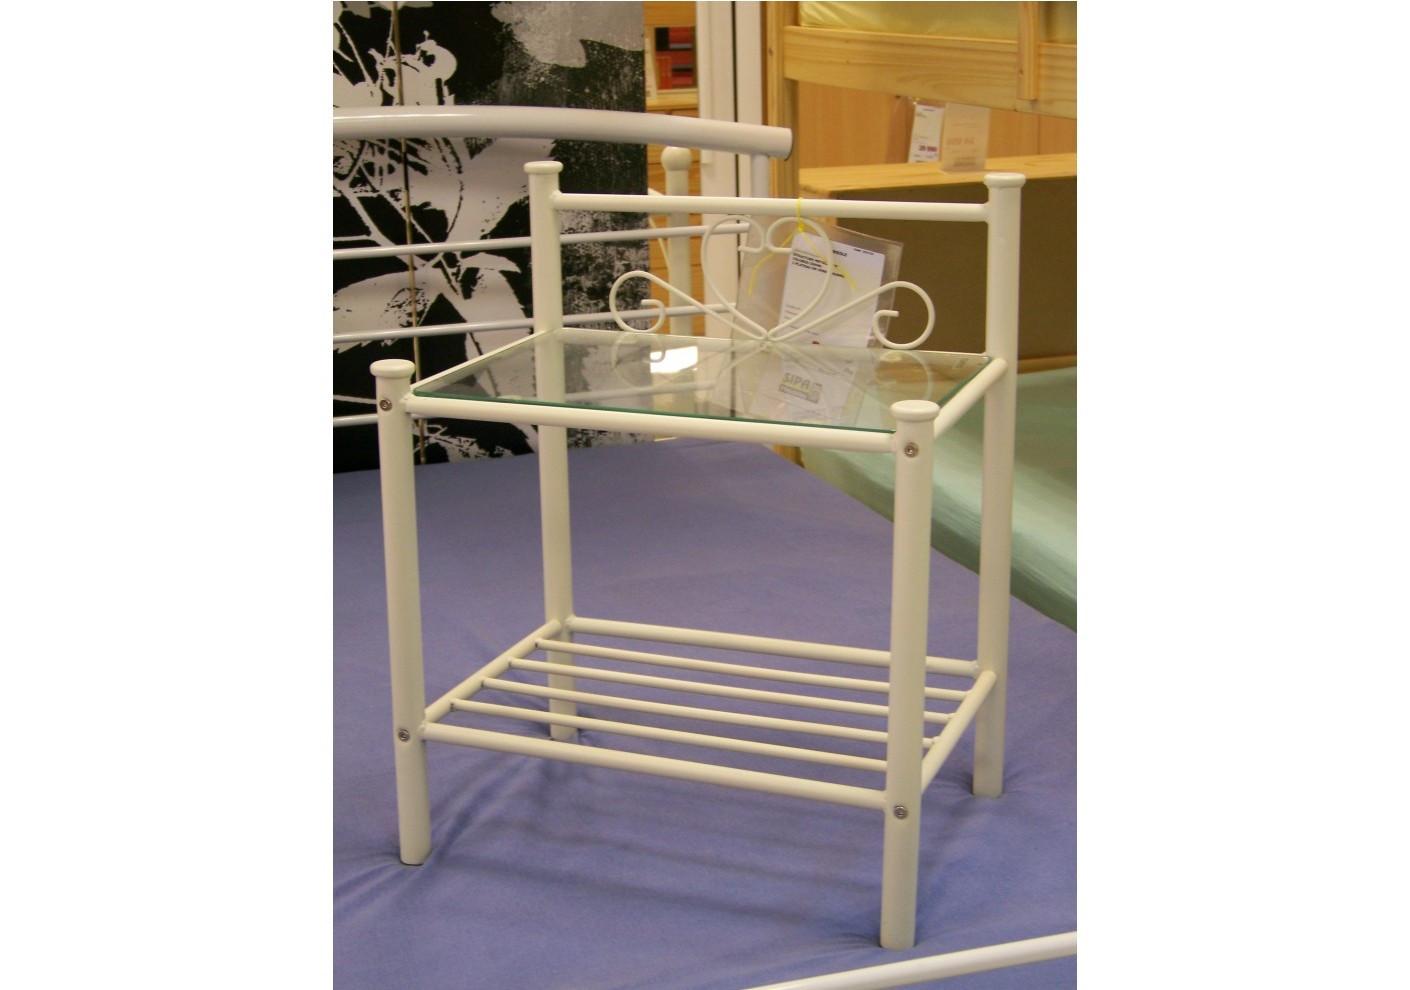 chevet aloa argent. Black Bedroom Furniture Sets. Home Design Ideas